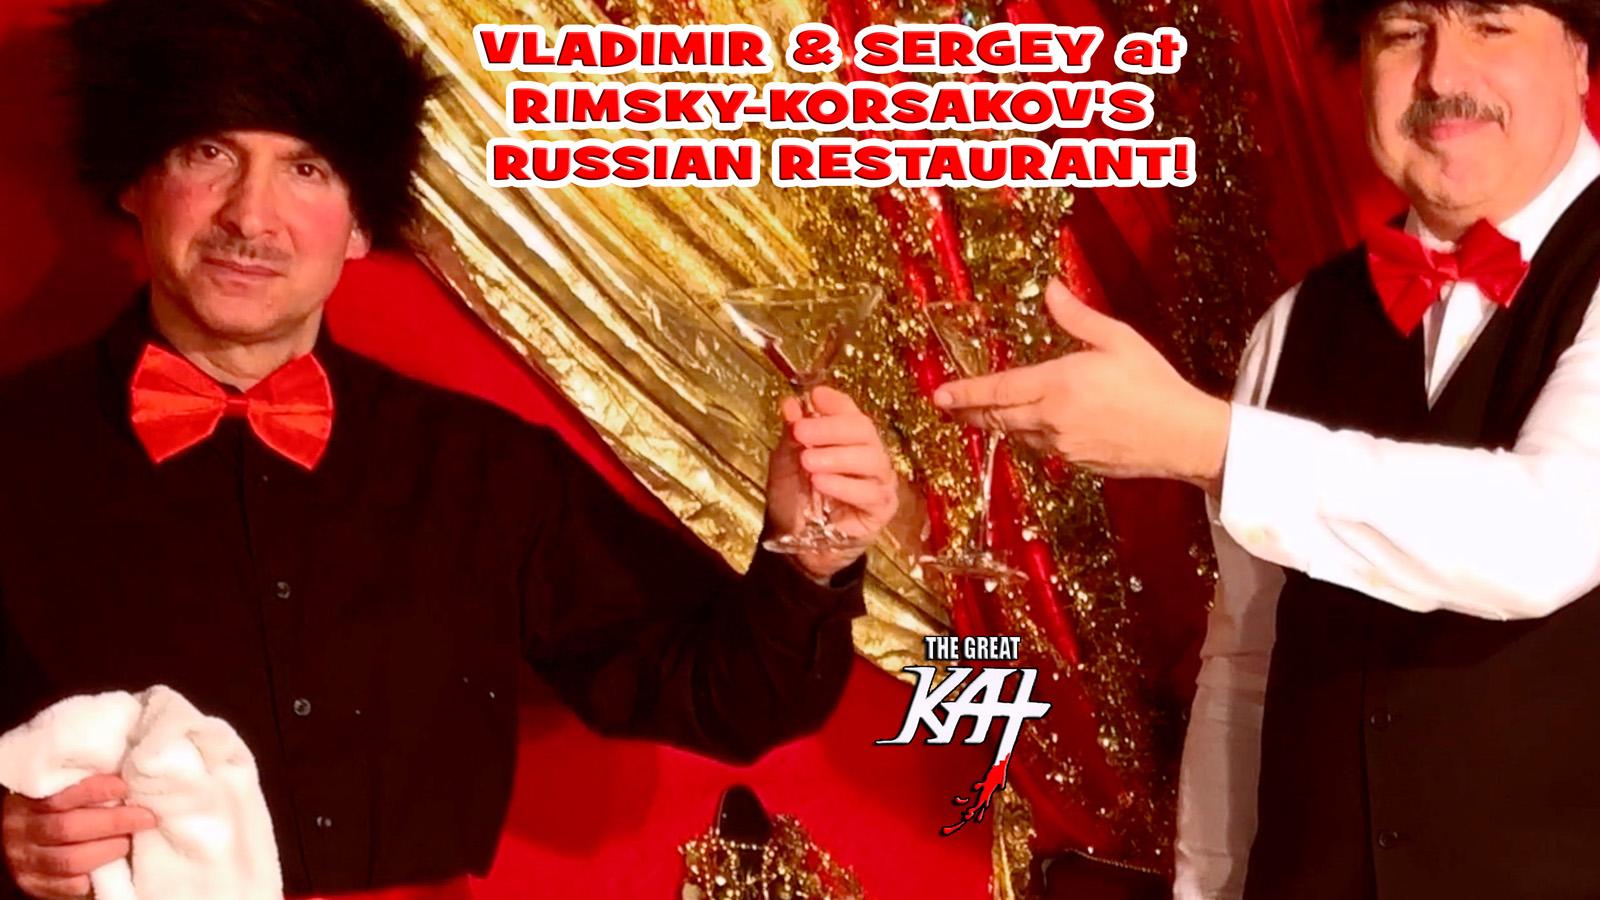 "VLADIMIR & SERGEY at RIMSKY-KORSAKOV'S RUSSIAN RESTAURANT! From ""CHEF GREAT KAT COOKS RUSSIAN CAVIAR AND BLINI WITH RIMSKY-KORSAKOV"" VIDEO!!"